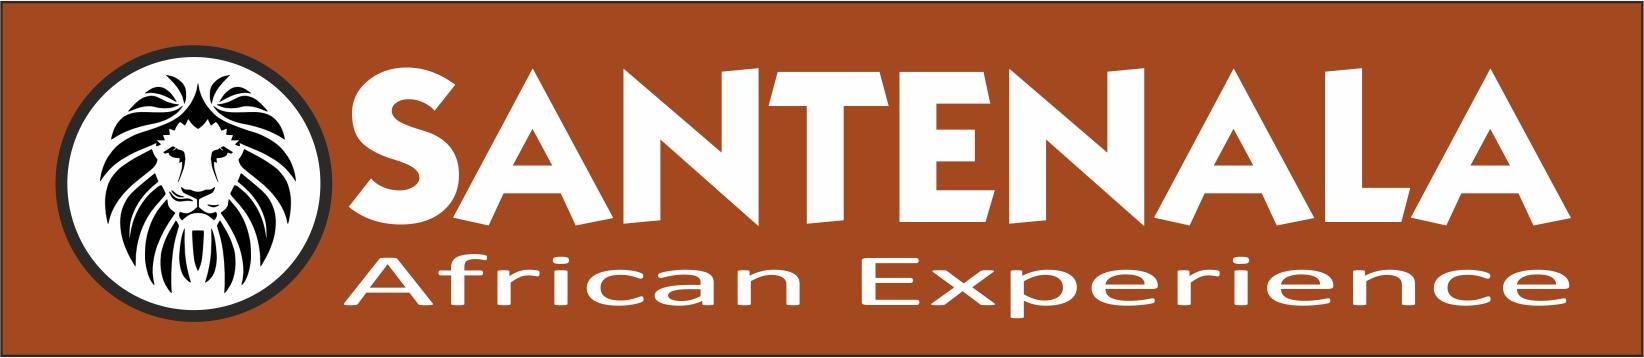 SANTENALA Logo.jpg